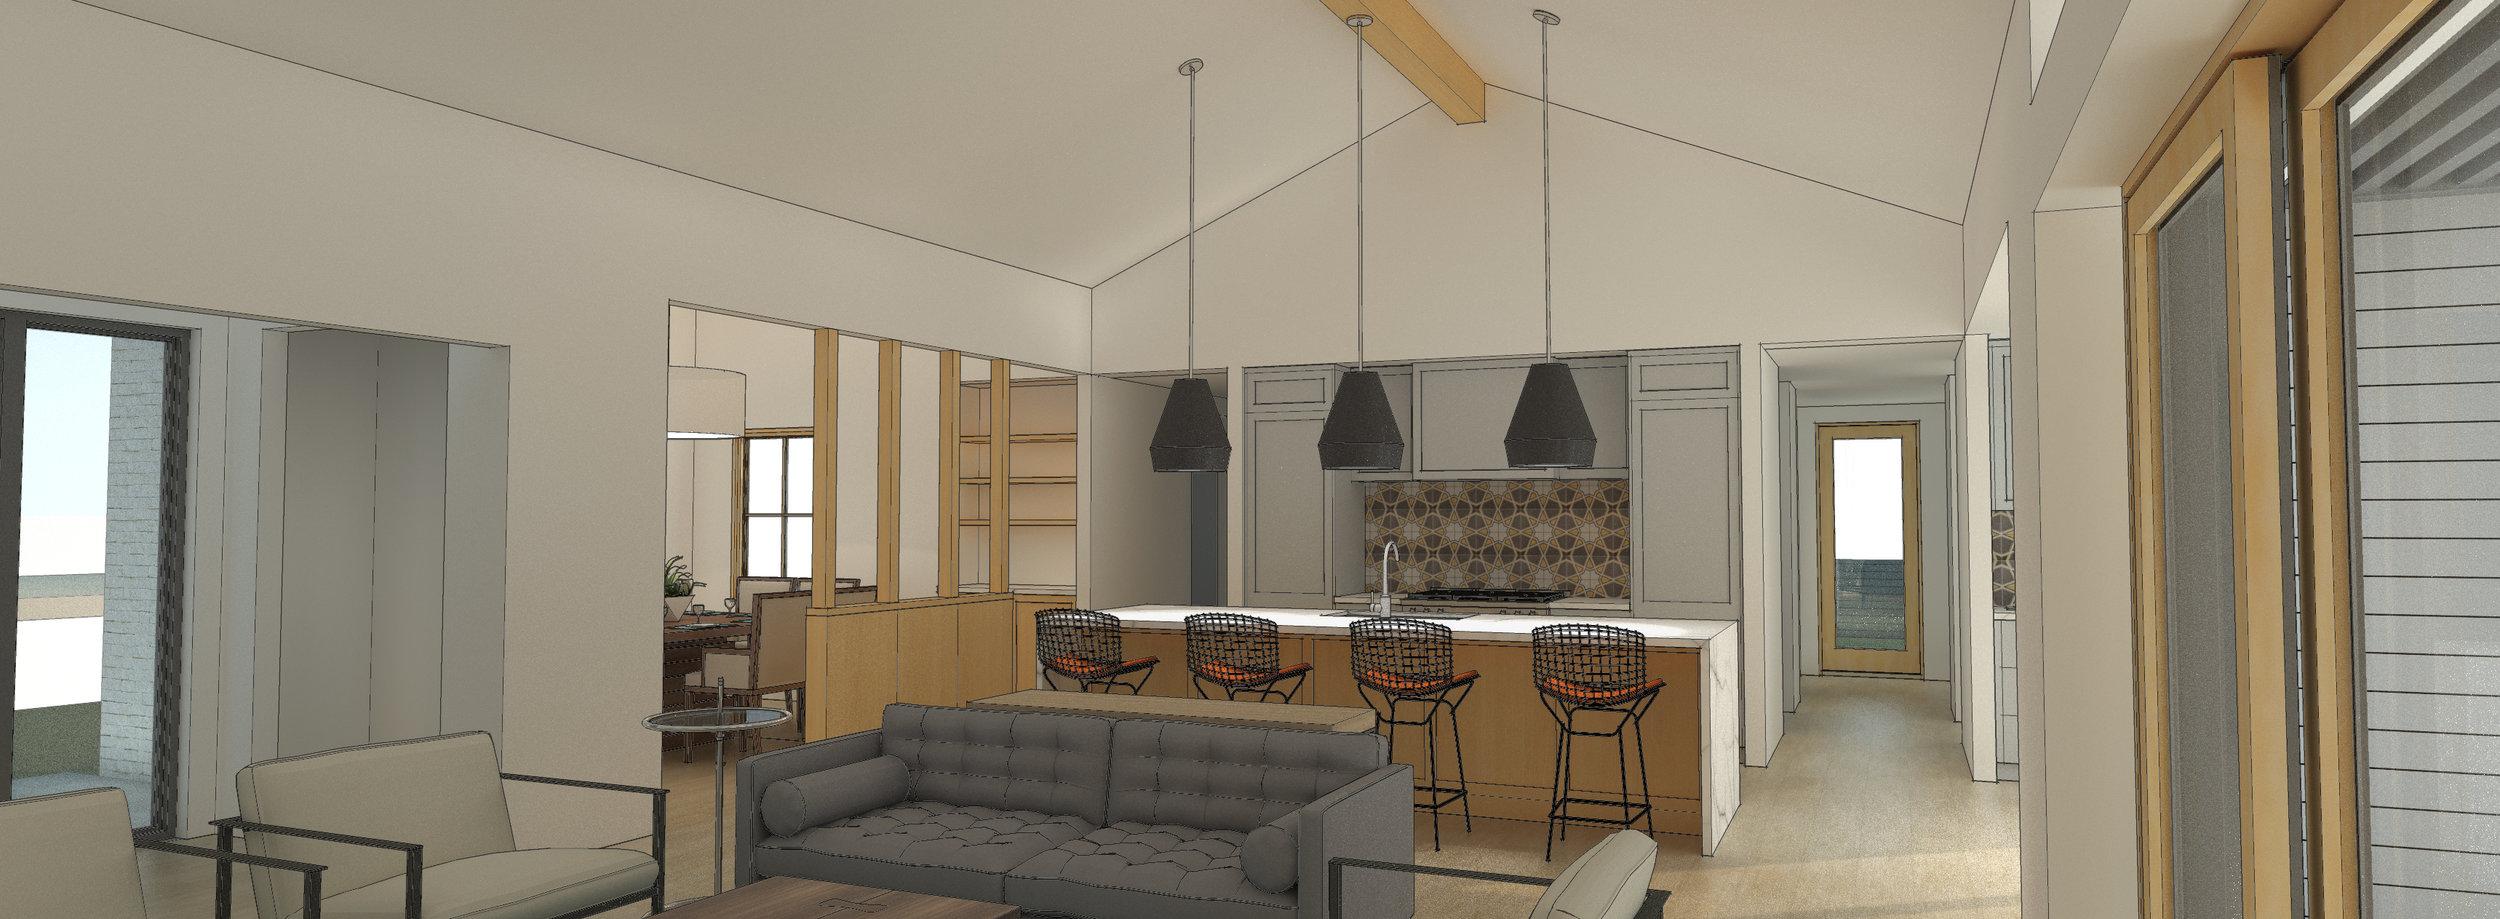 Lang Residence_Interior_1 (1) copy.jpg